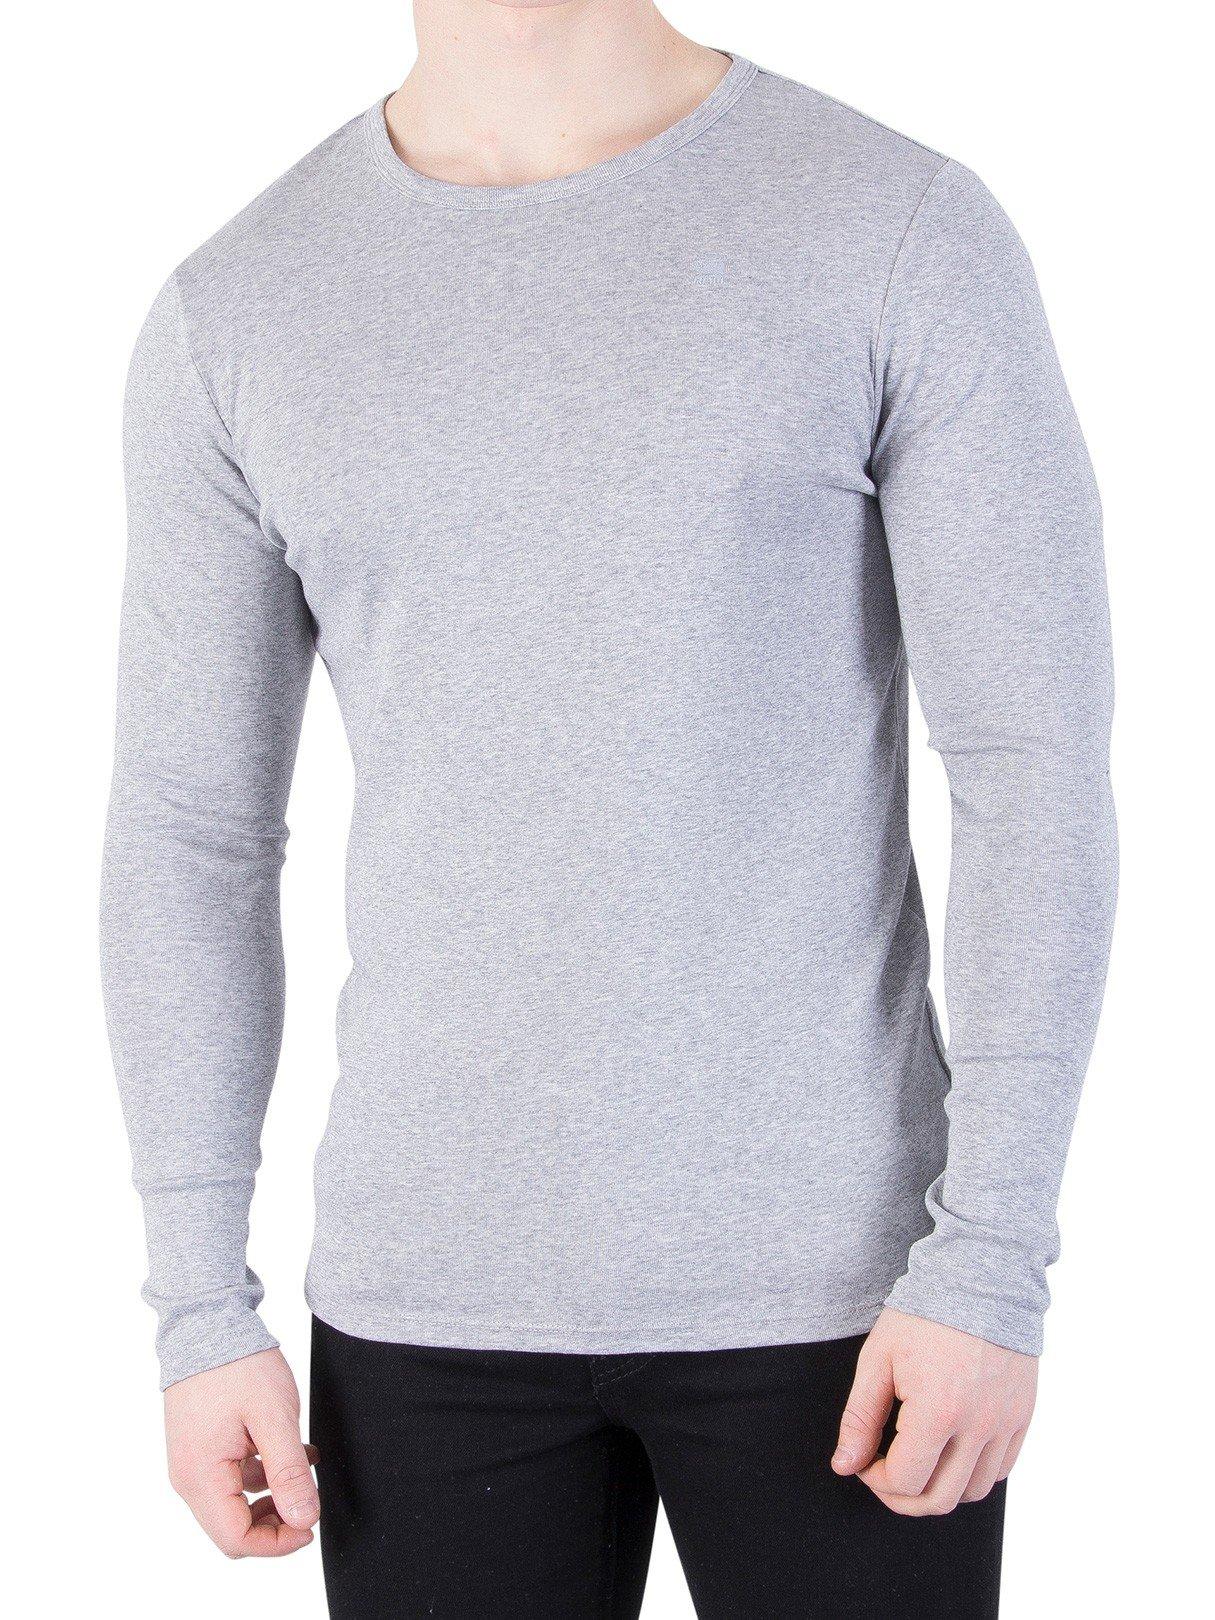 G-Star Men's Longsleeved Slim T-Shirt, Grey, X-Large